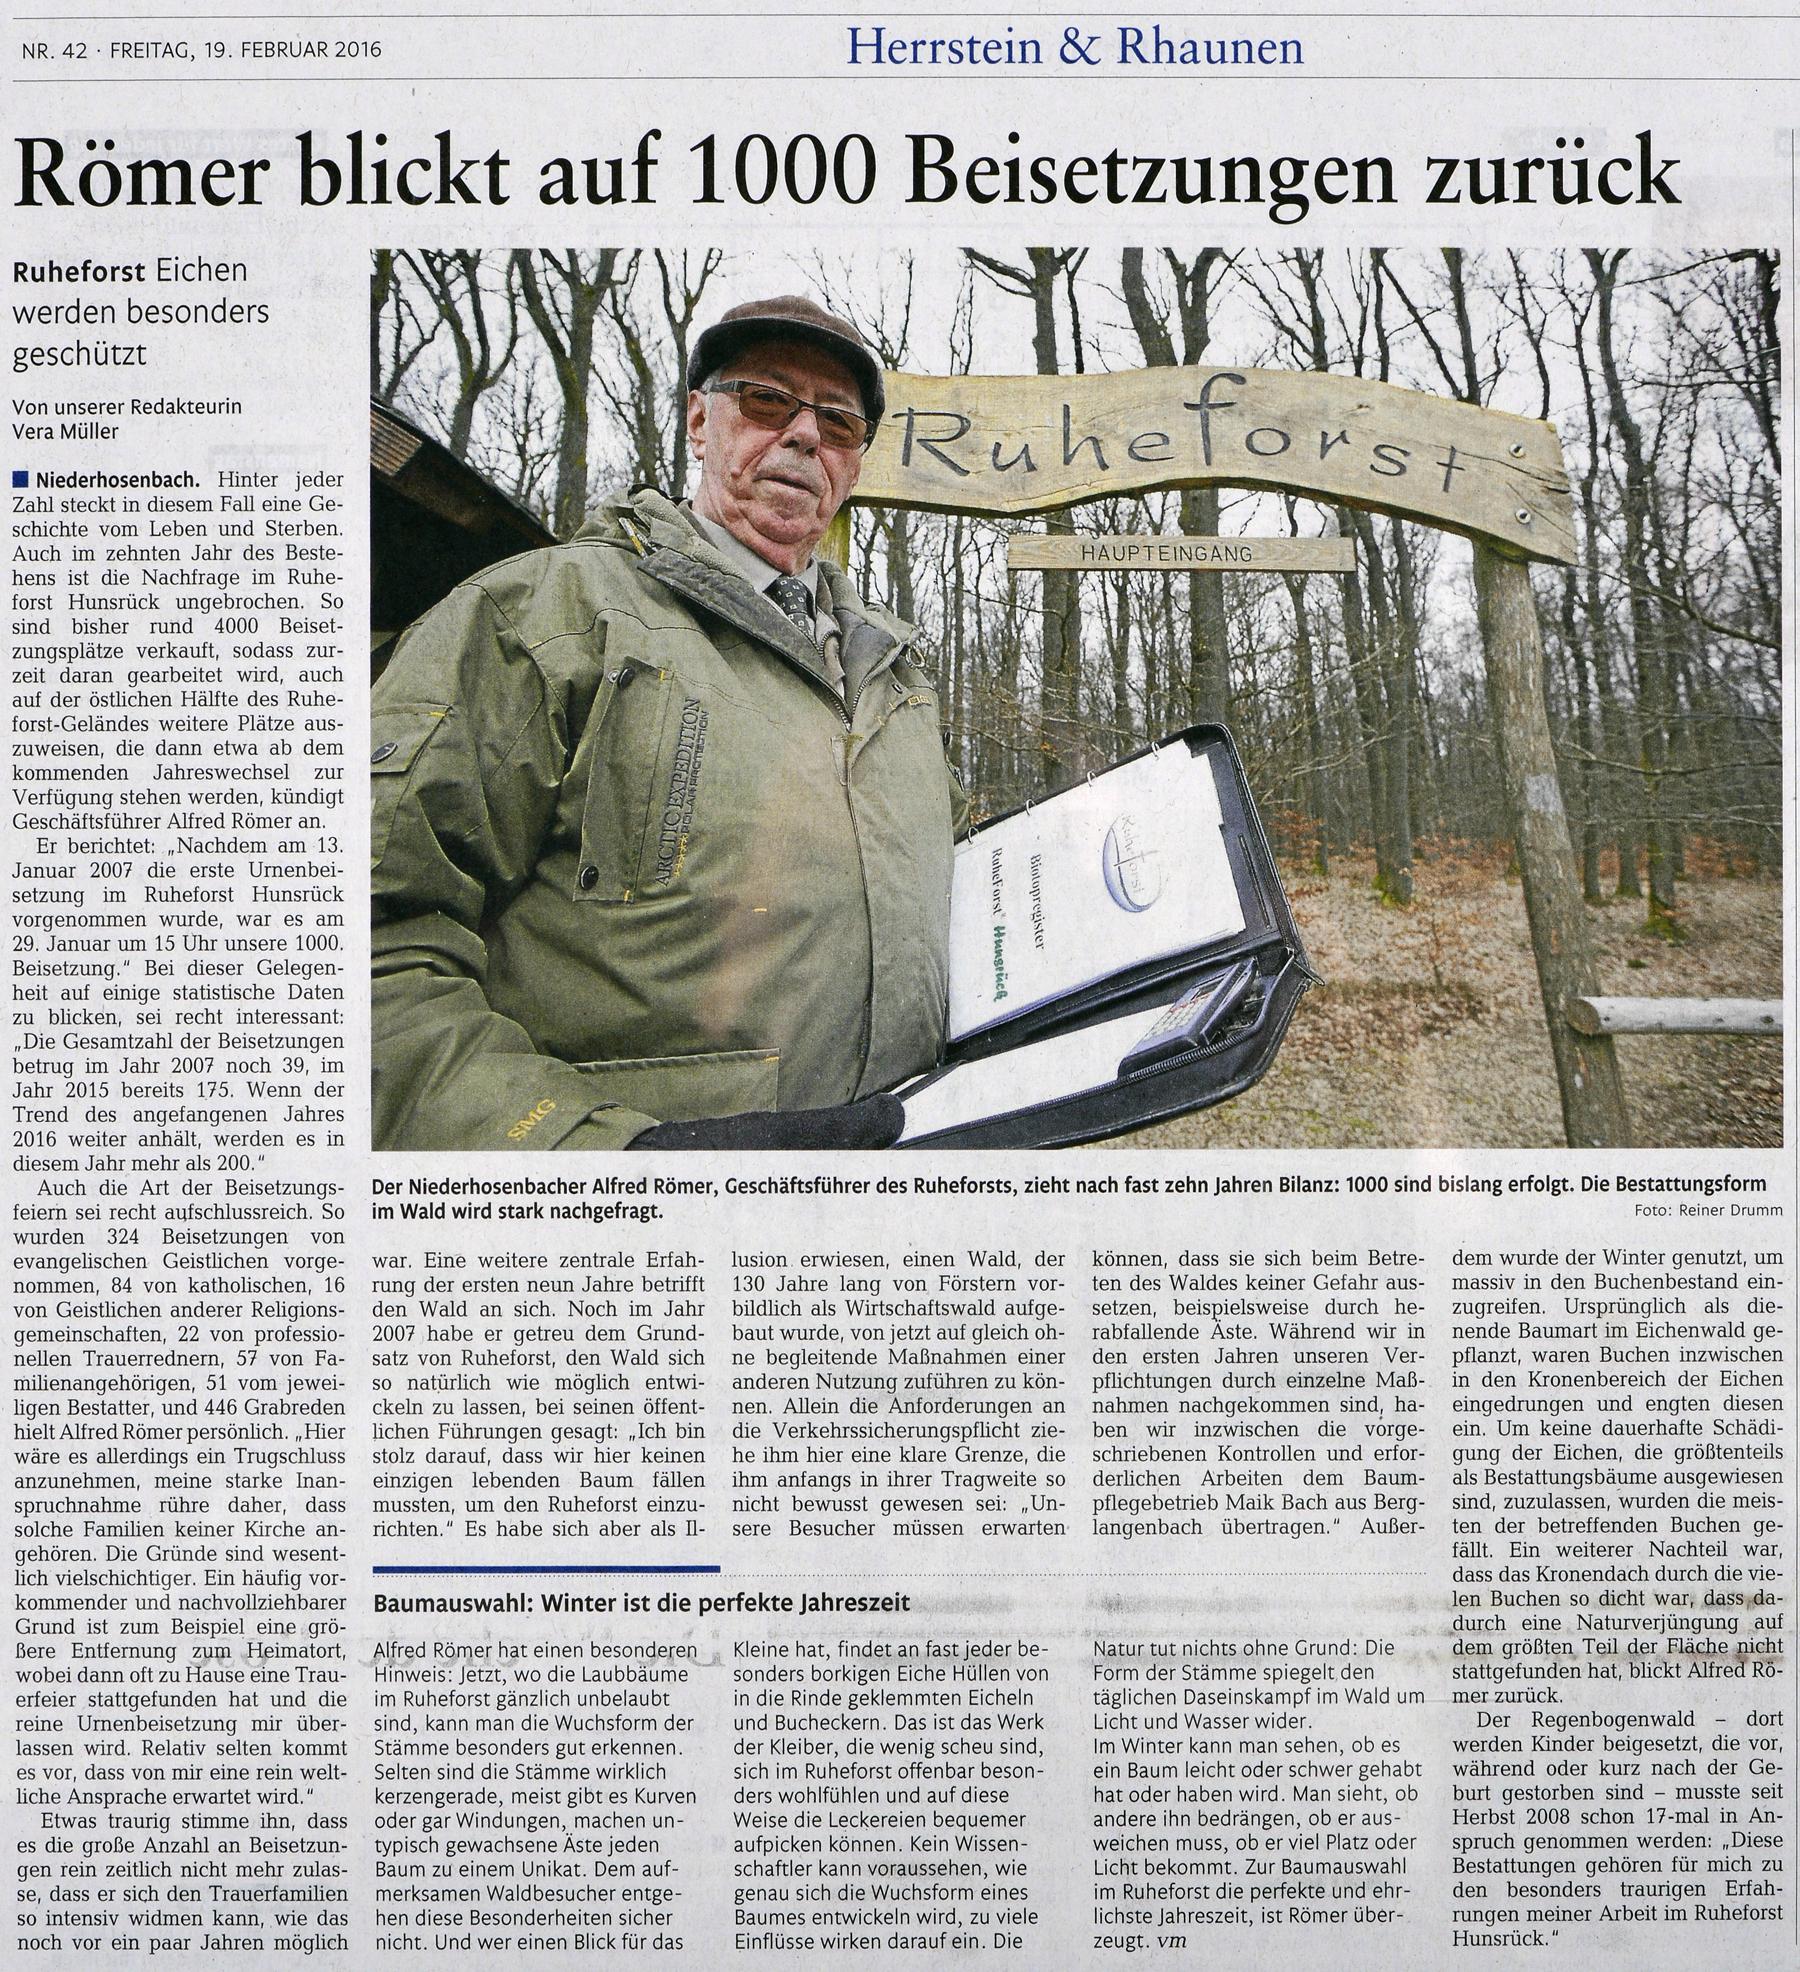 2016.02.19. Nahe-Zeitung